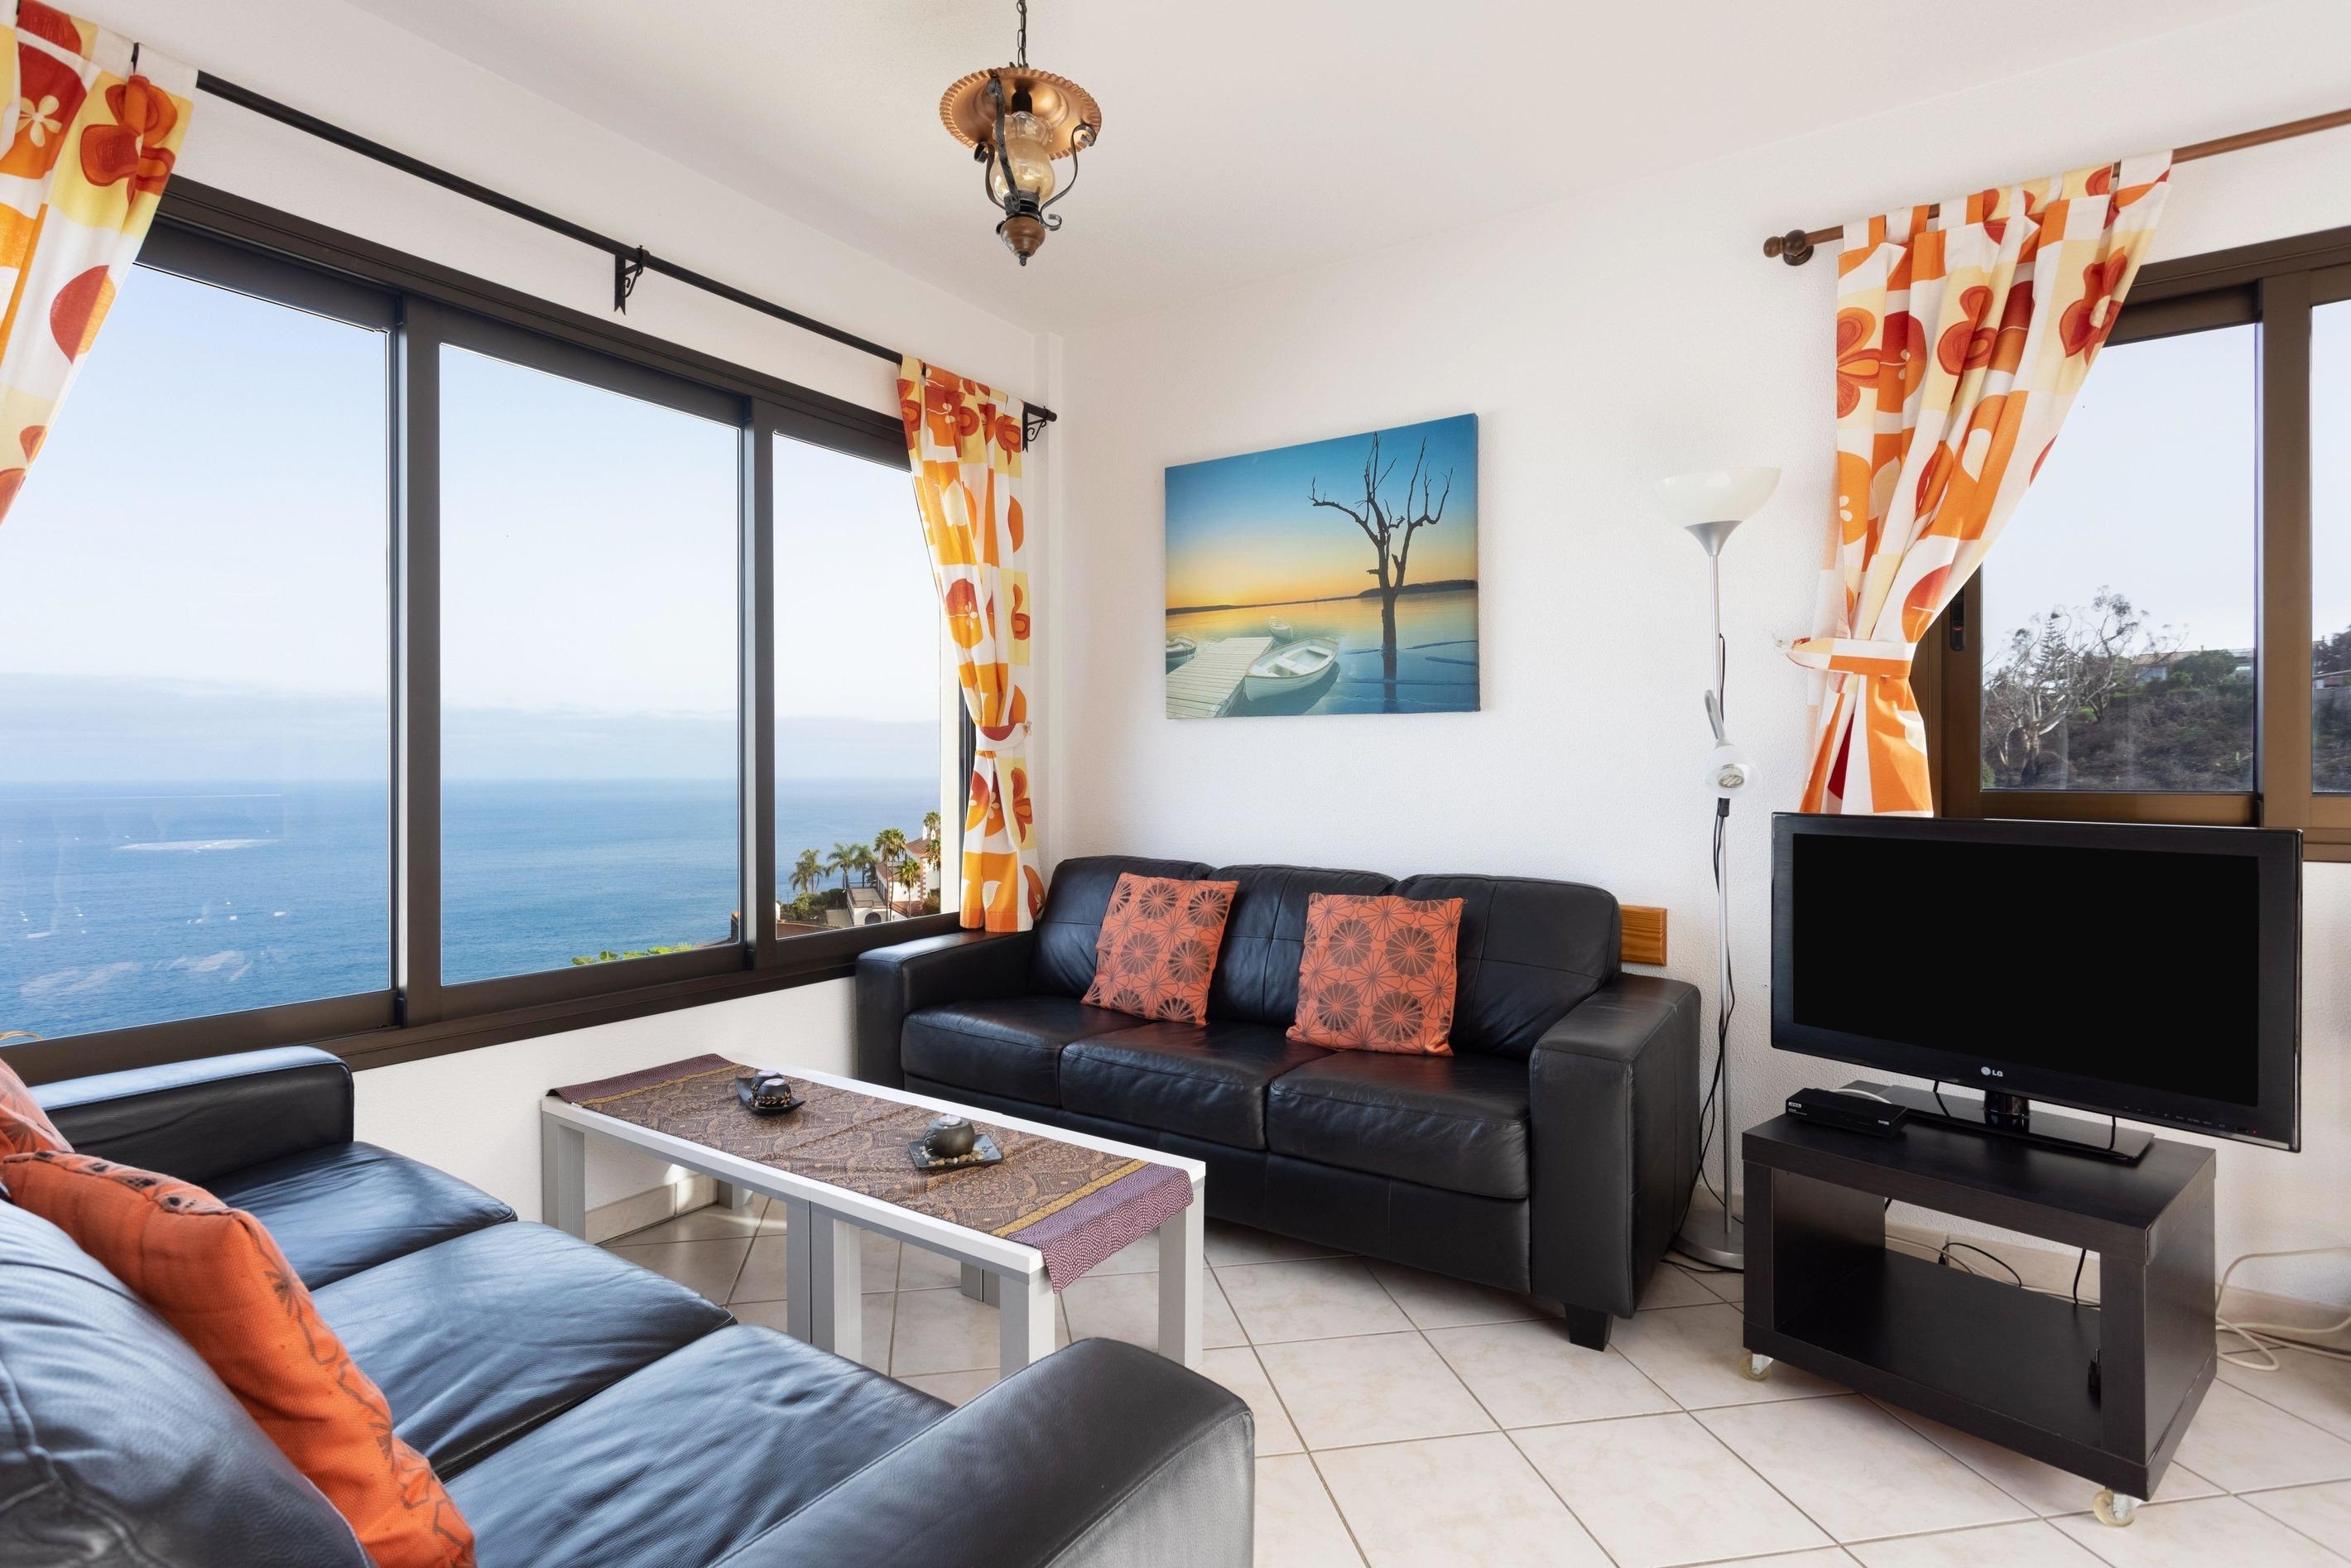 Appartement de vacances Fewo Atico Marazul, mit  Panorama- und Meerblick, Pool, Terrasse, Grill, Parkplatz und WLA (2492979), Santa Ursula, Ténérife, Iles Canaries, Espagne, image 2